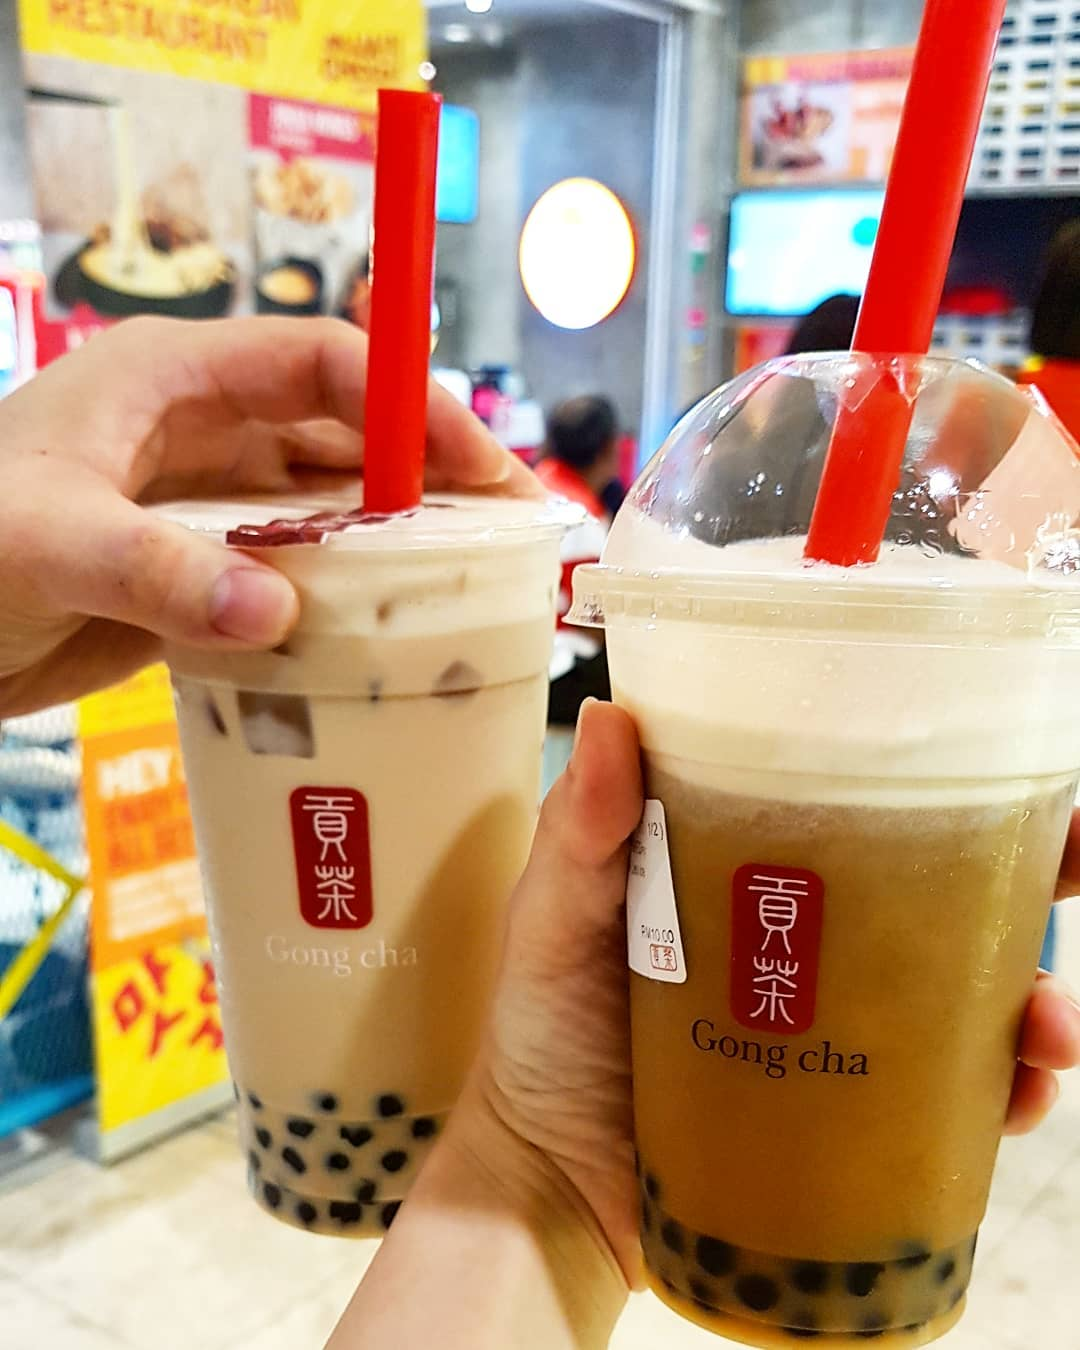 KL Bubble Tea Street Is Boba Heaven With 10 Shops Open Till